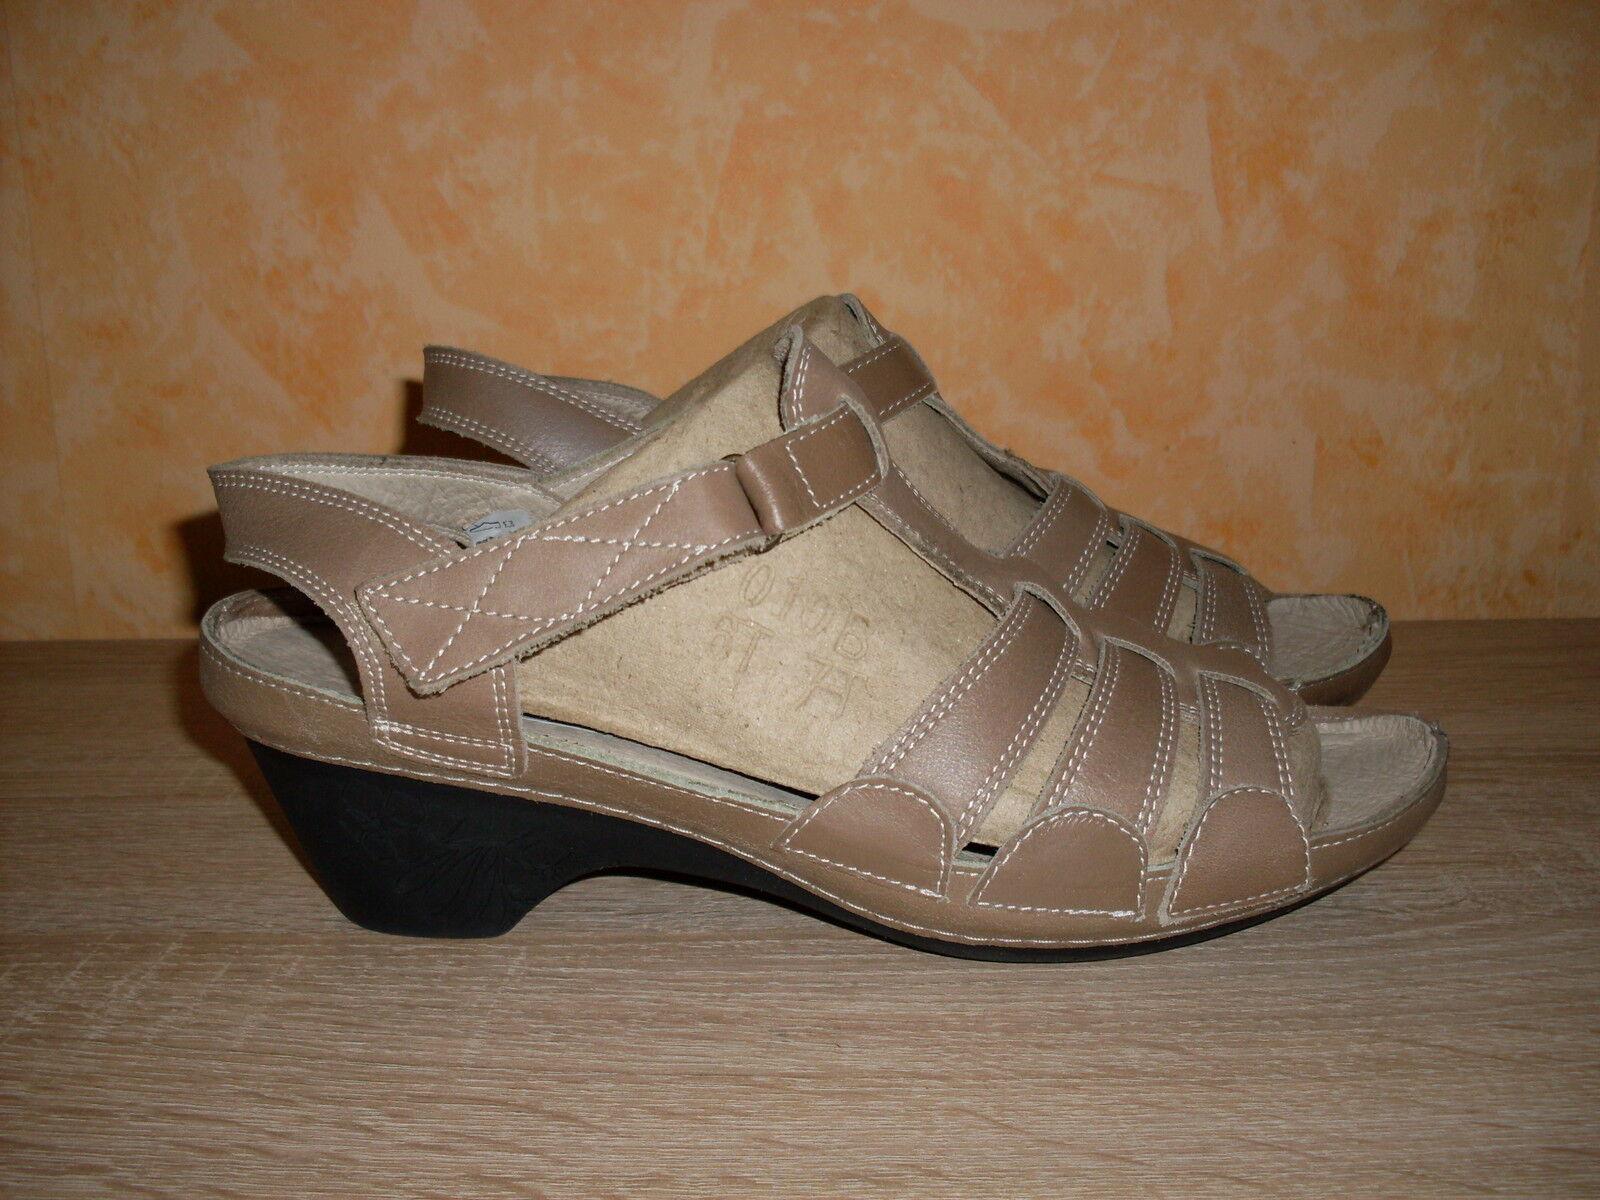 La mia Klett Sandalette mit Shok Absatz NEU Gr. 41 o. 42 in brown & Nappa Leder